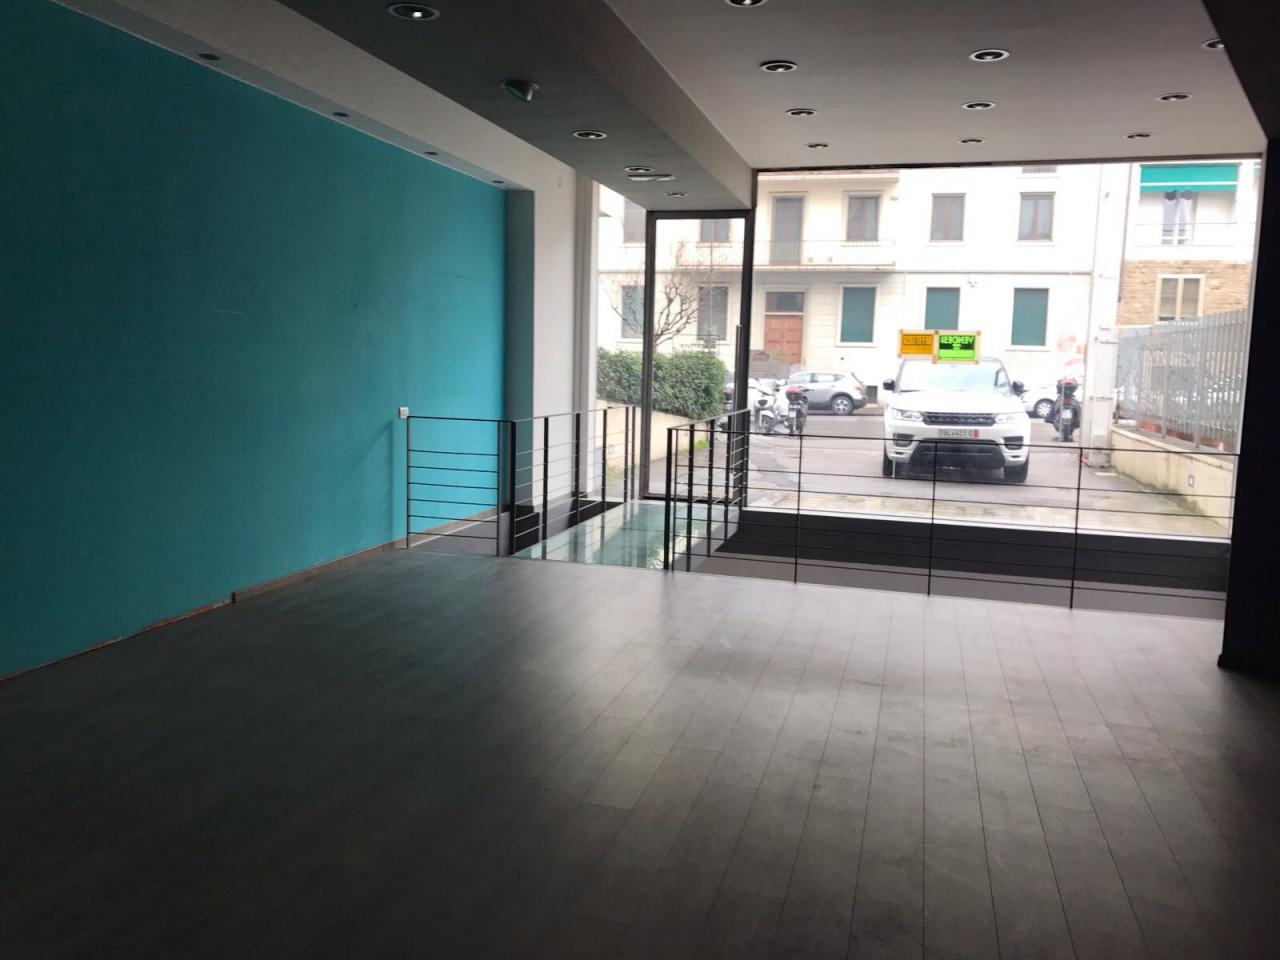 Negozio / Locale in Vendita a Firenze